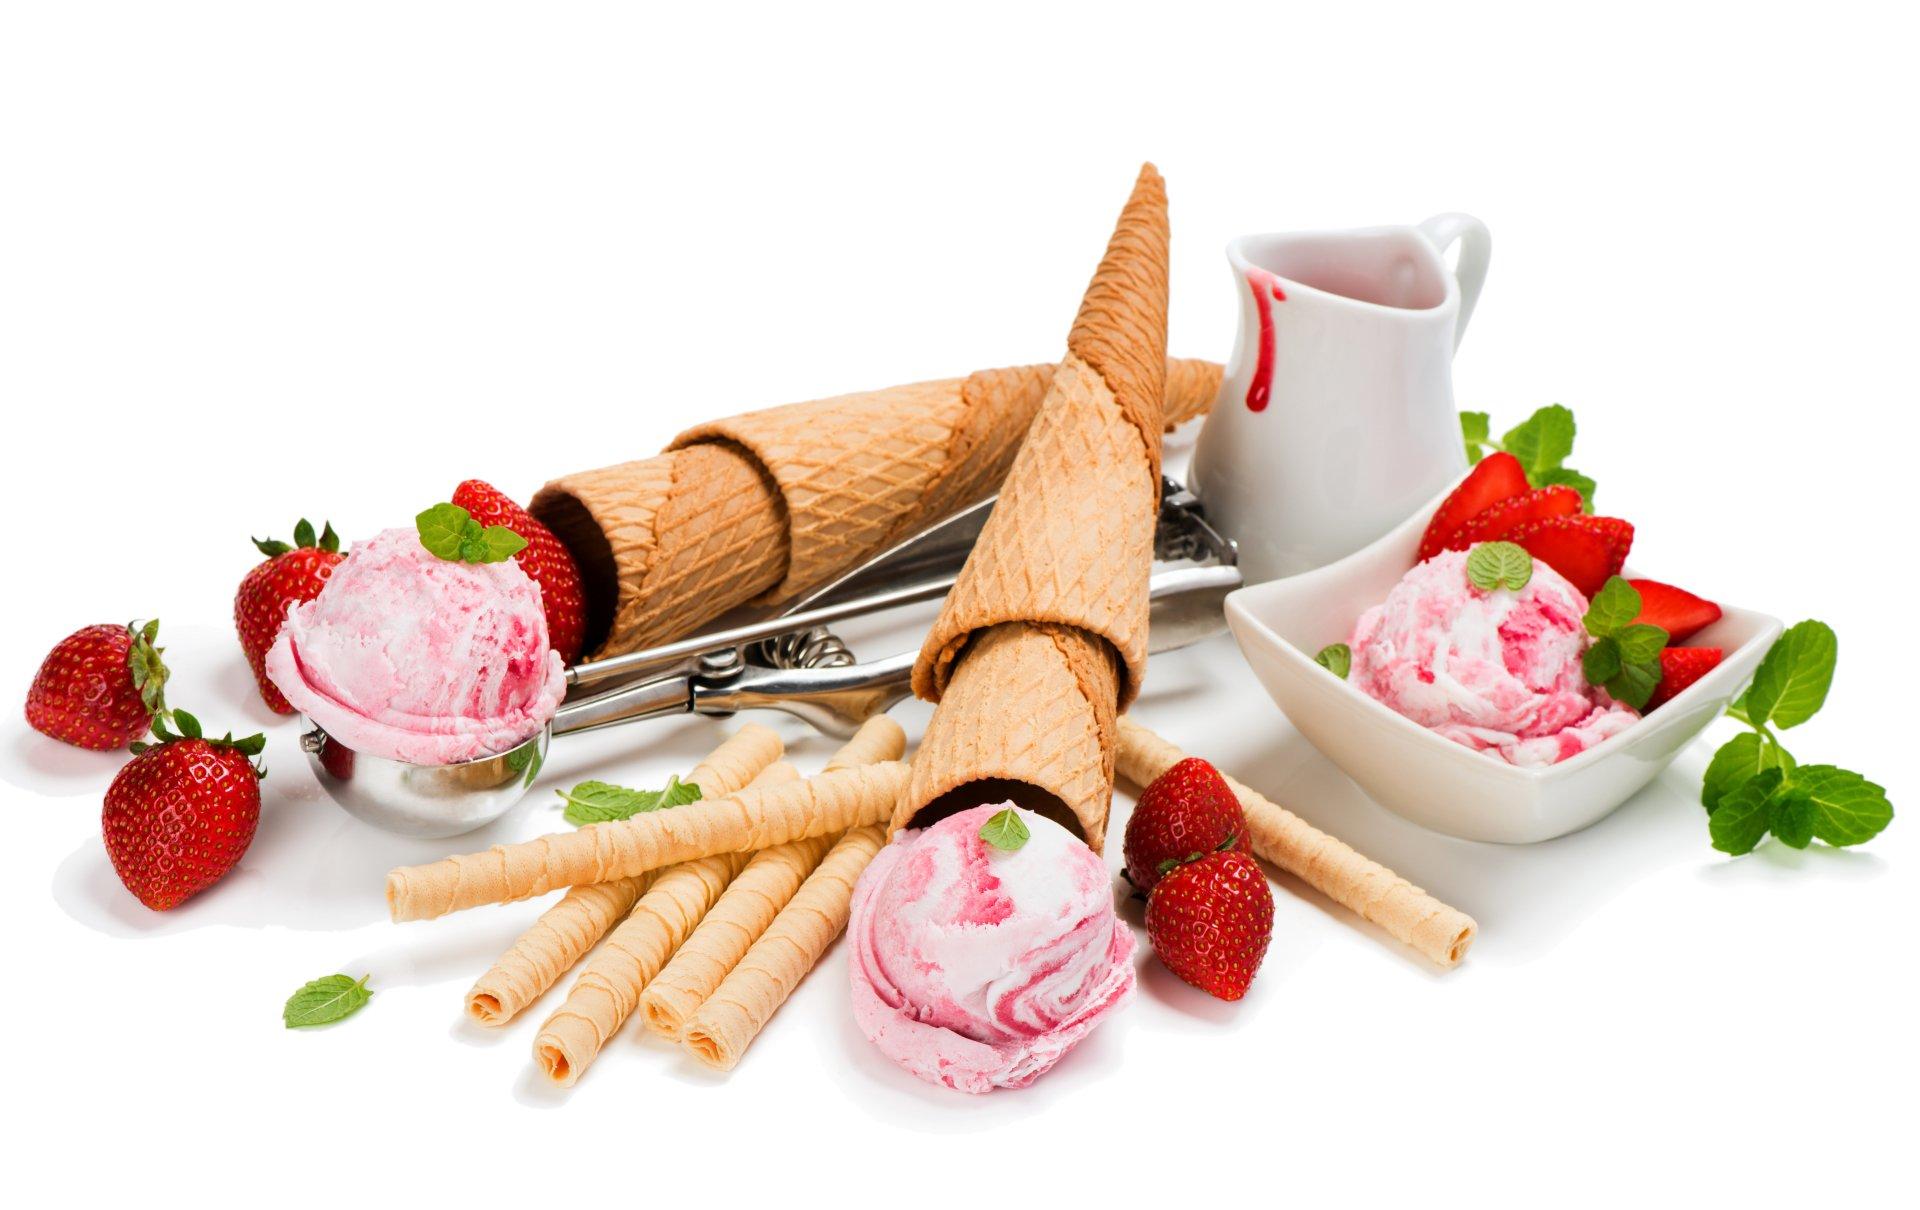 Food - Ice Cream  Still Life Waffle Cone Strawberry Wallpaper